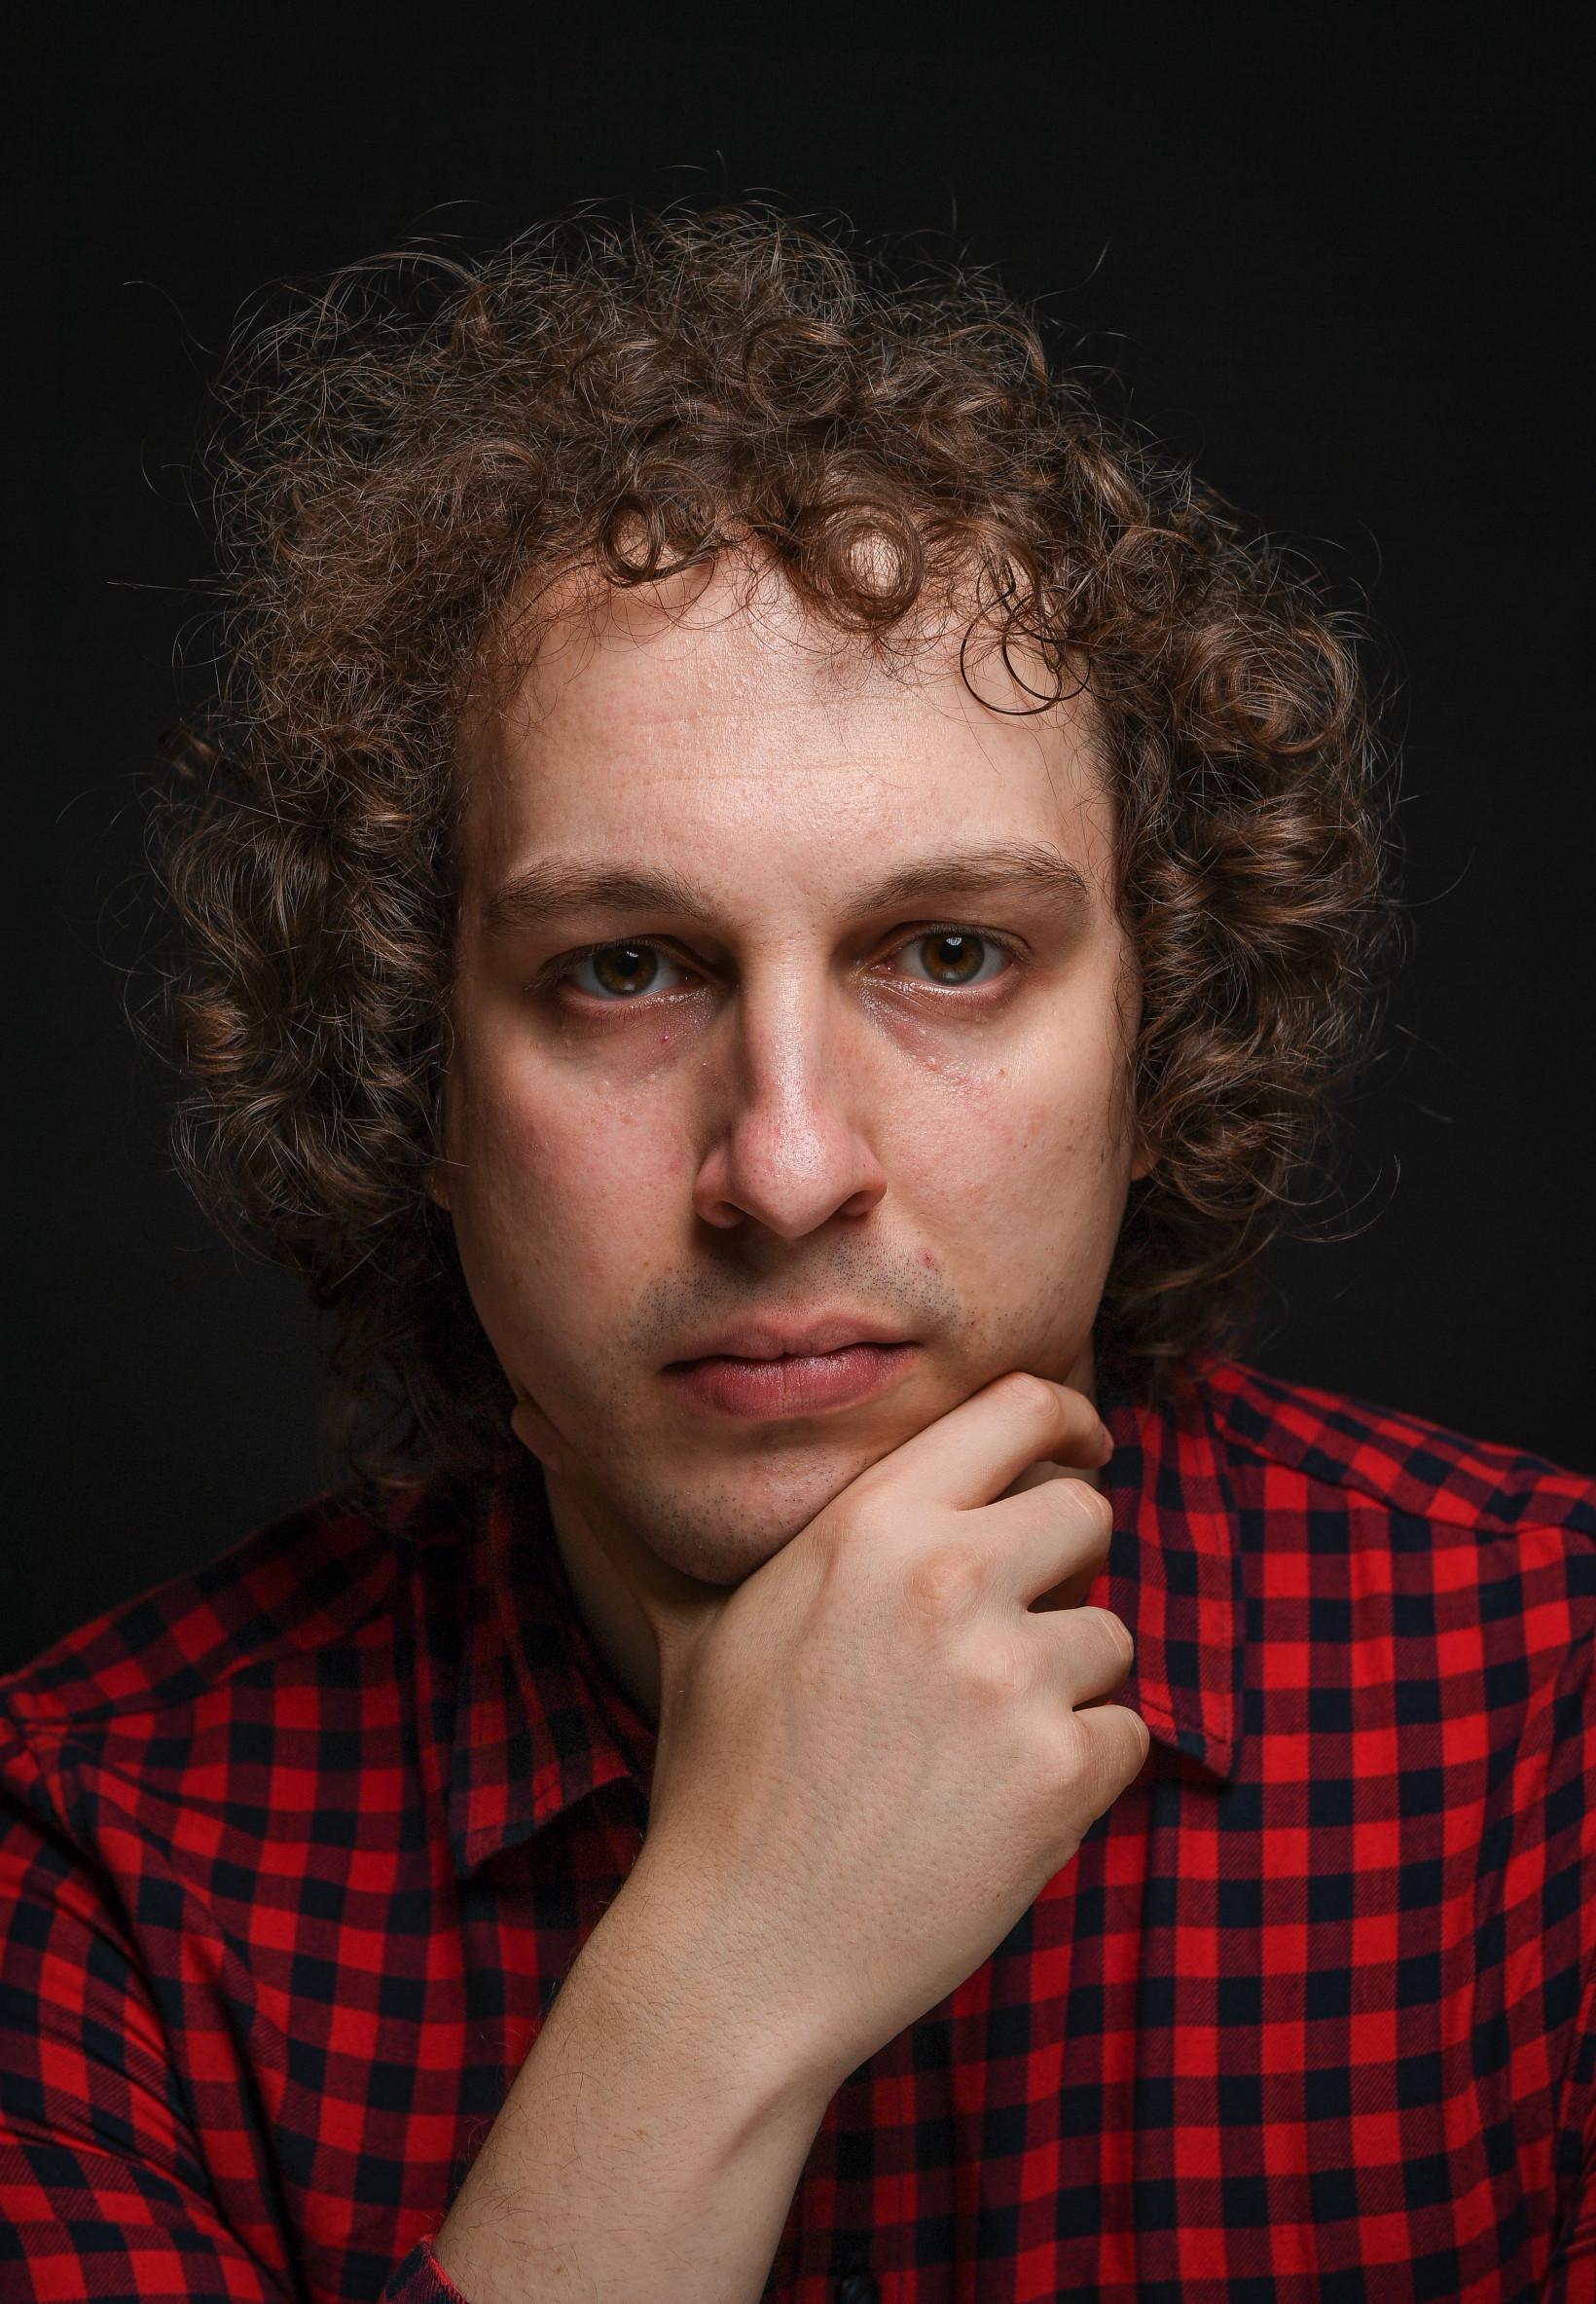 Chris Stokel-Walker, author of 'YouTubers'